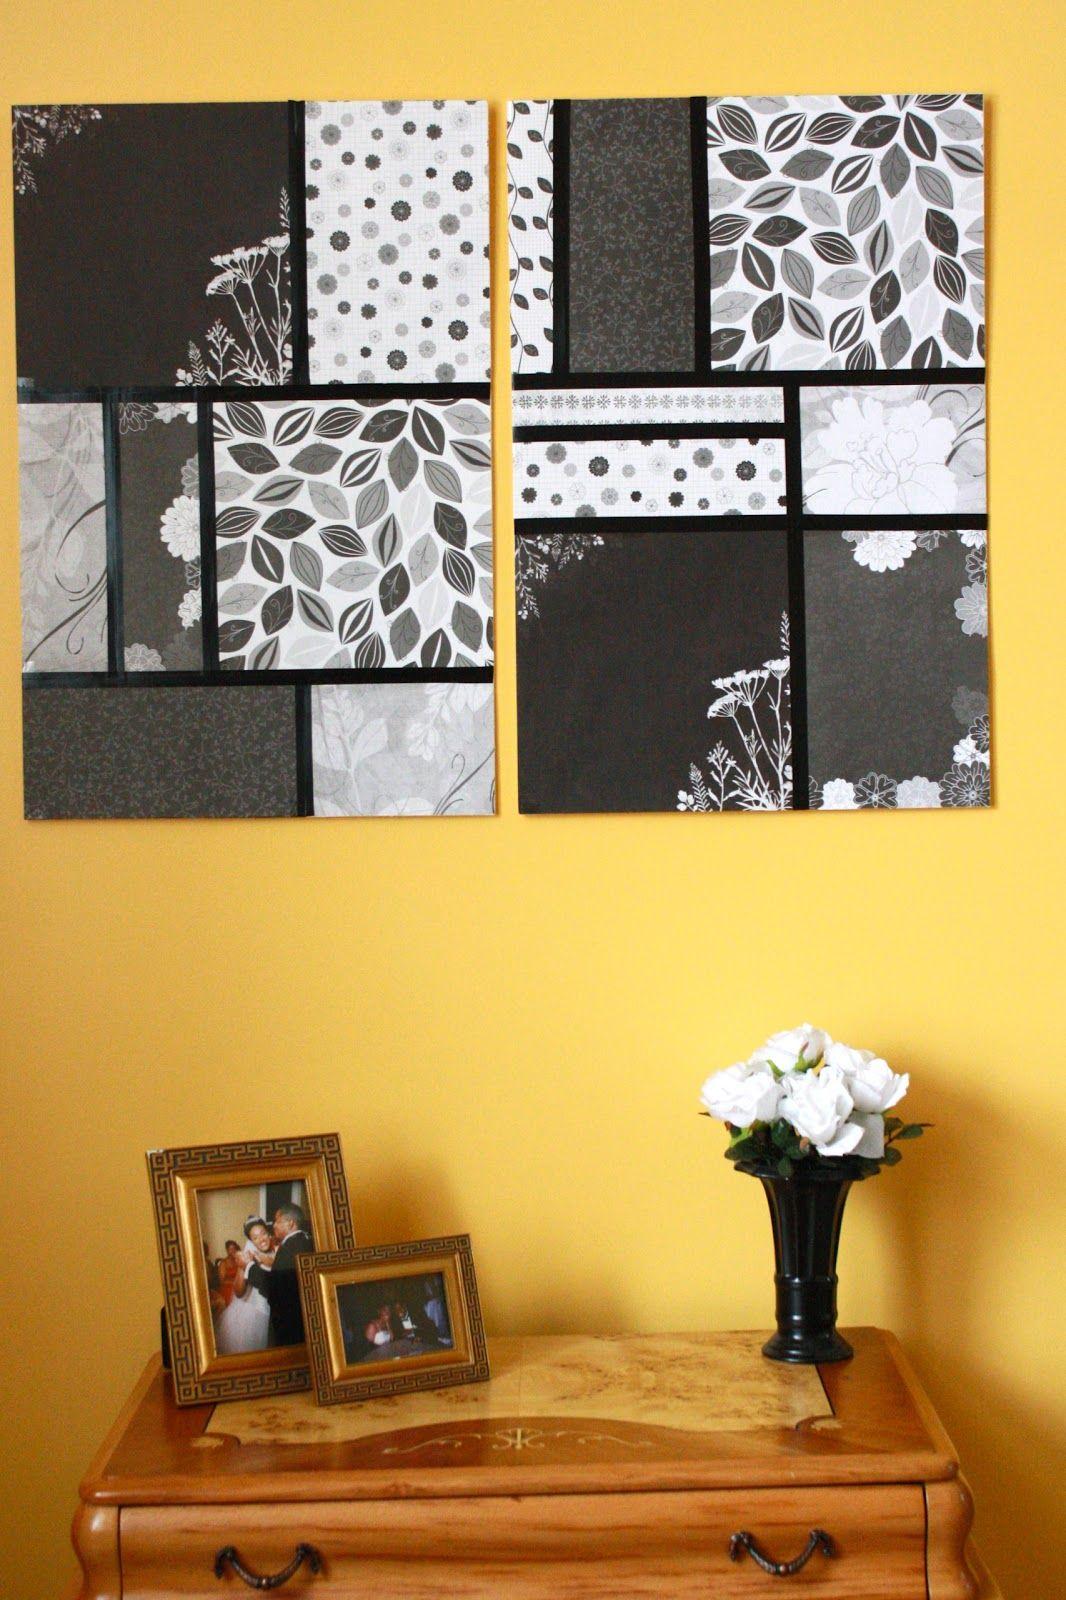 IMG_7992.jpg (1066×1600) | DIY and crafts | Pinterest | Cardboard ...